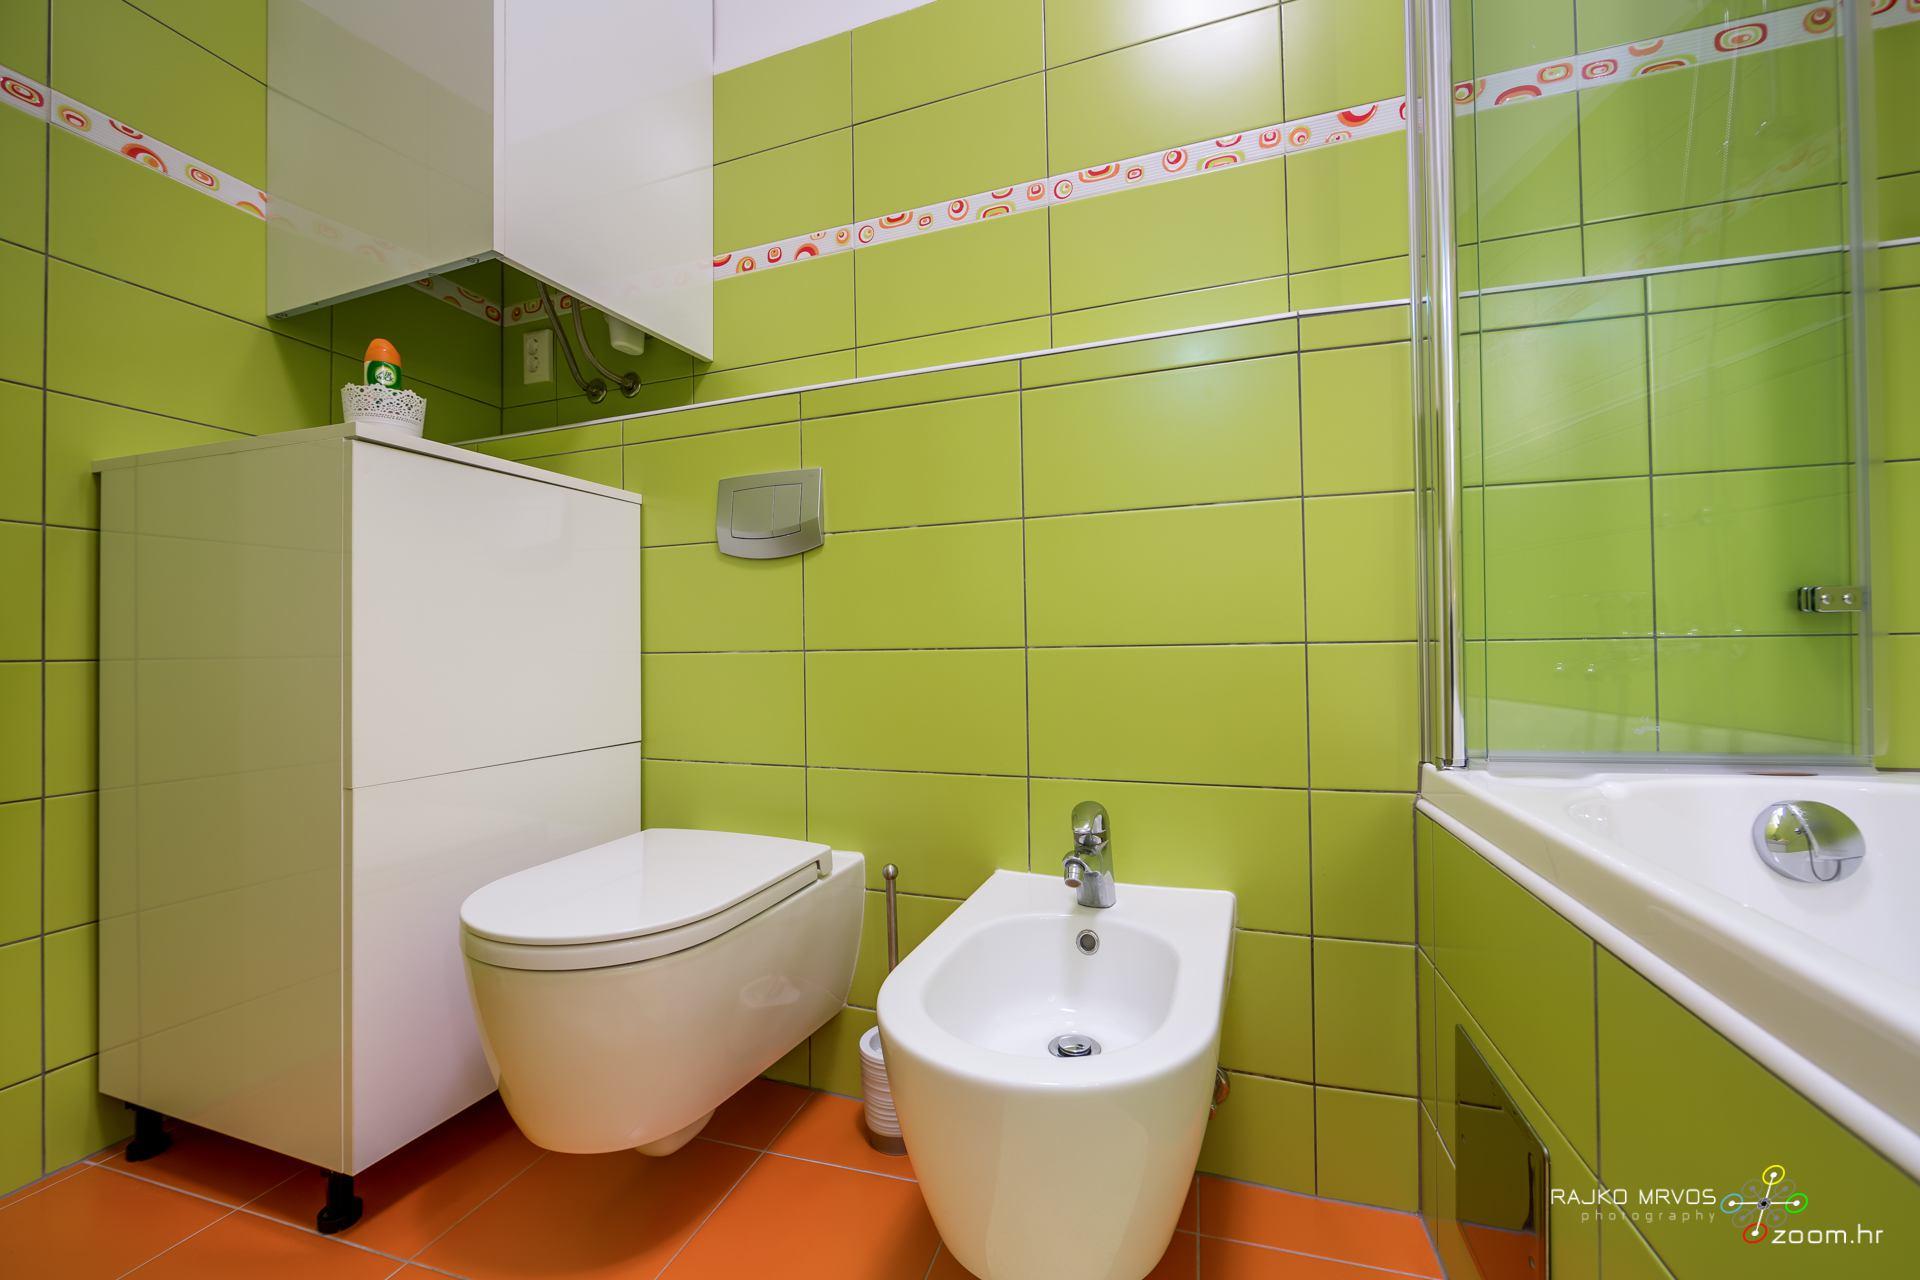 profesionalno-fotografiranje-interijera-fotograf-apartmana-apartman-Elena-Rijeka-31